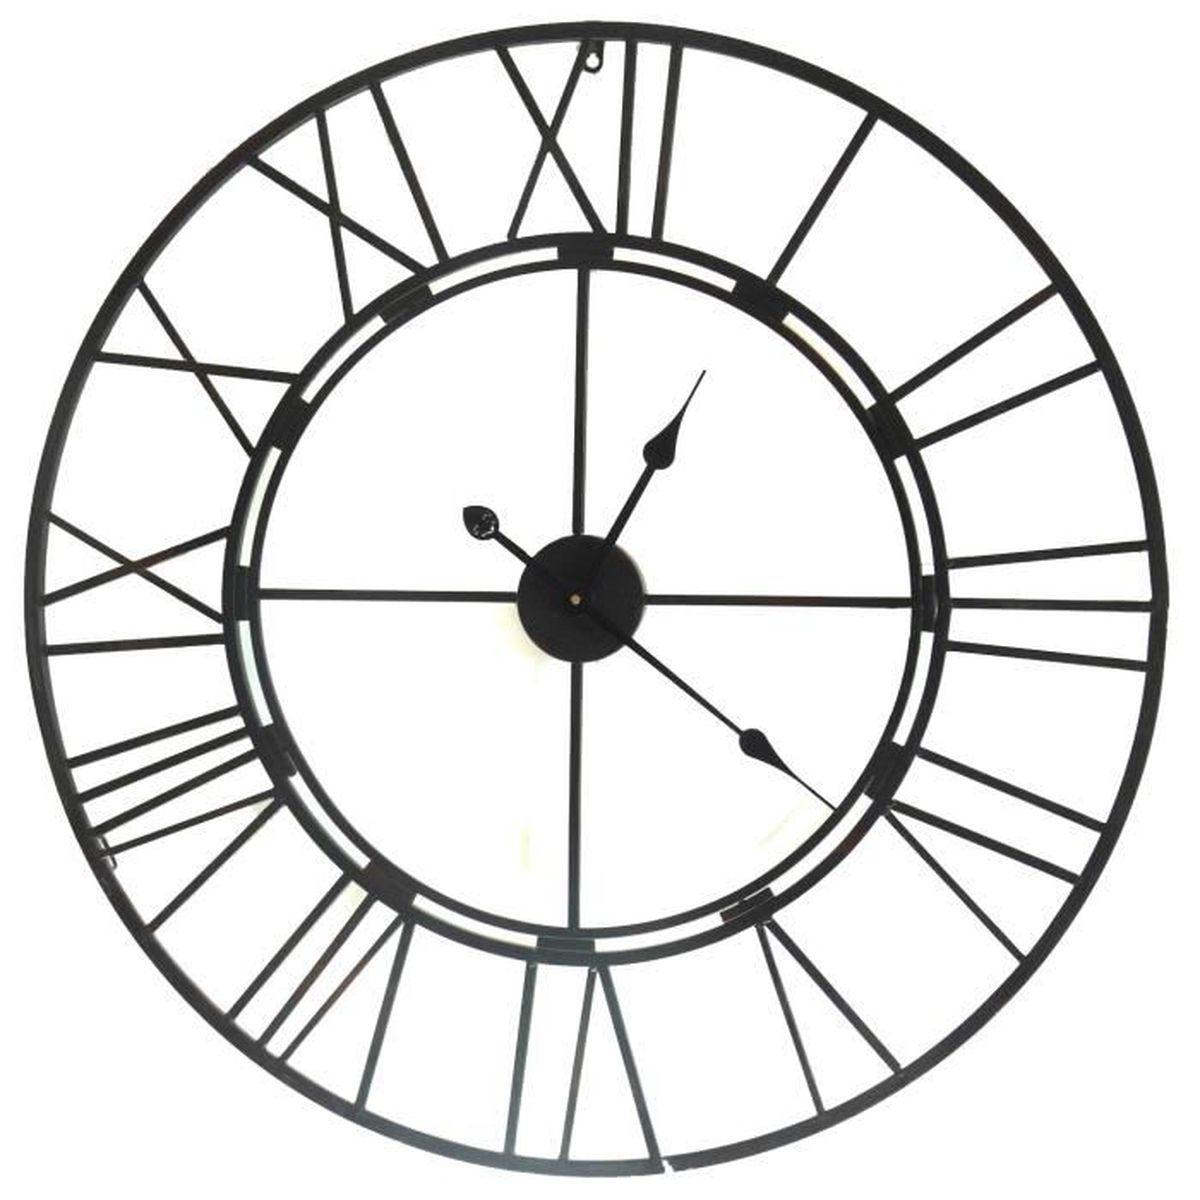 grande horloge en fer style loft pendule murale acier 105cm achat vente horloge cdiscount